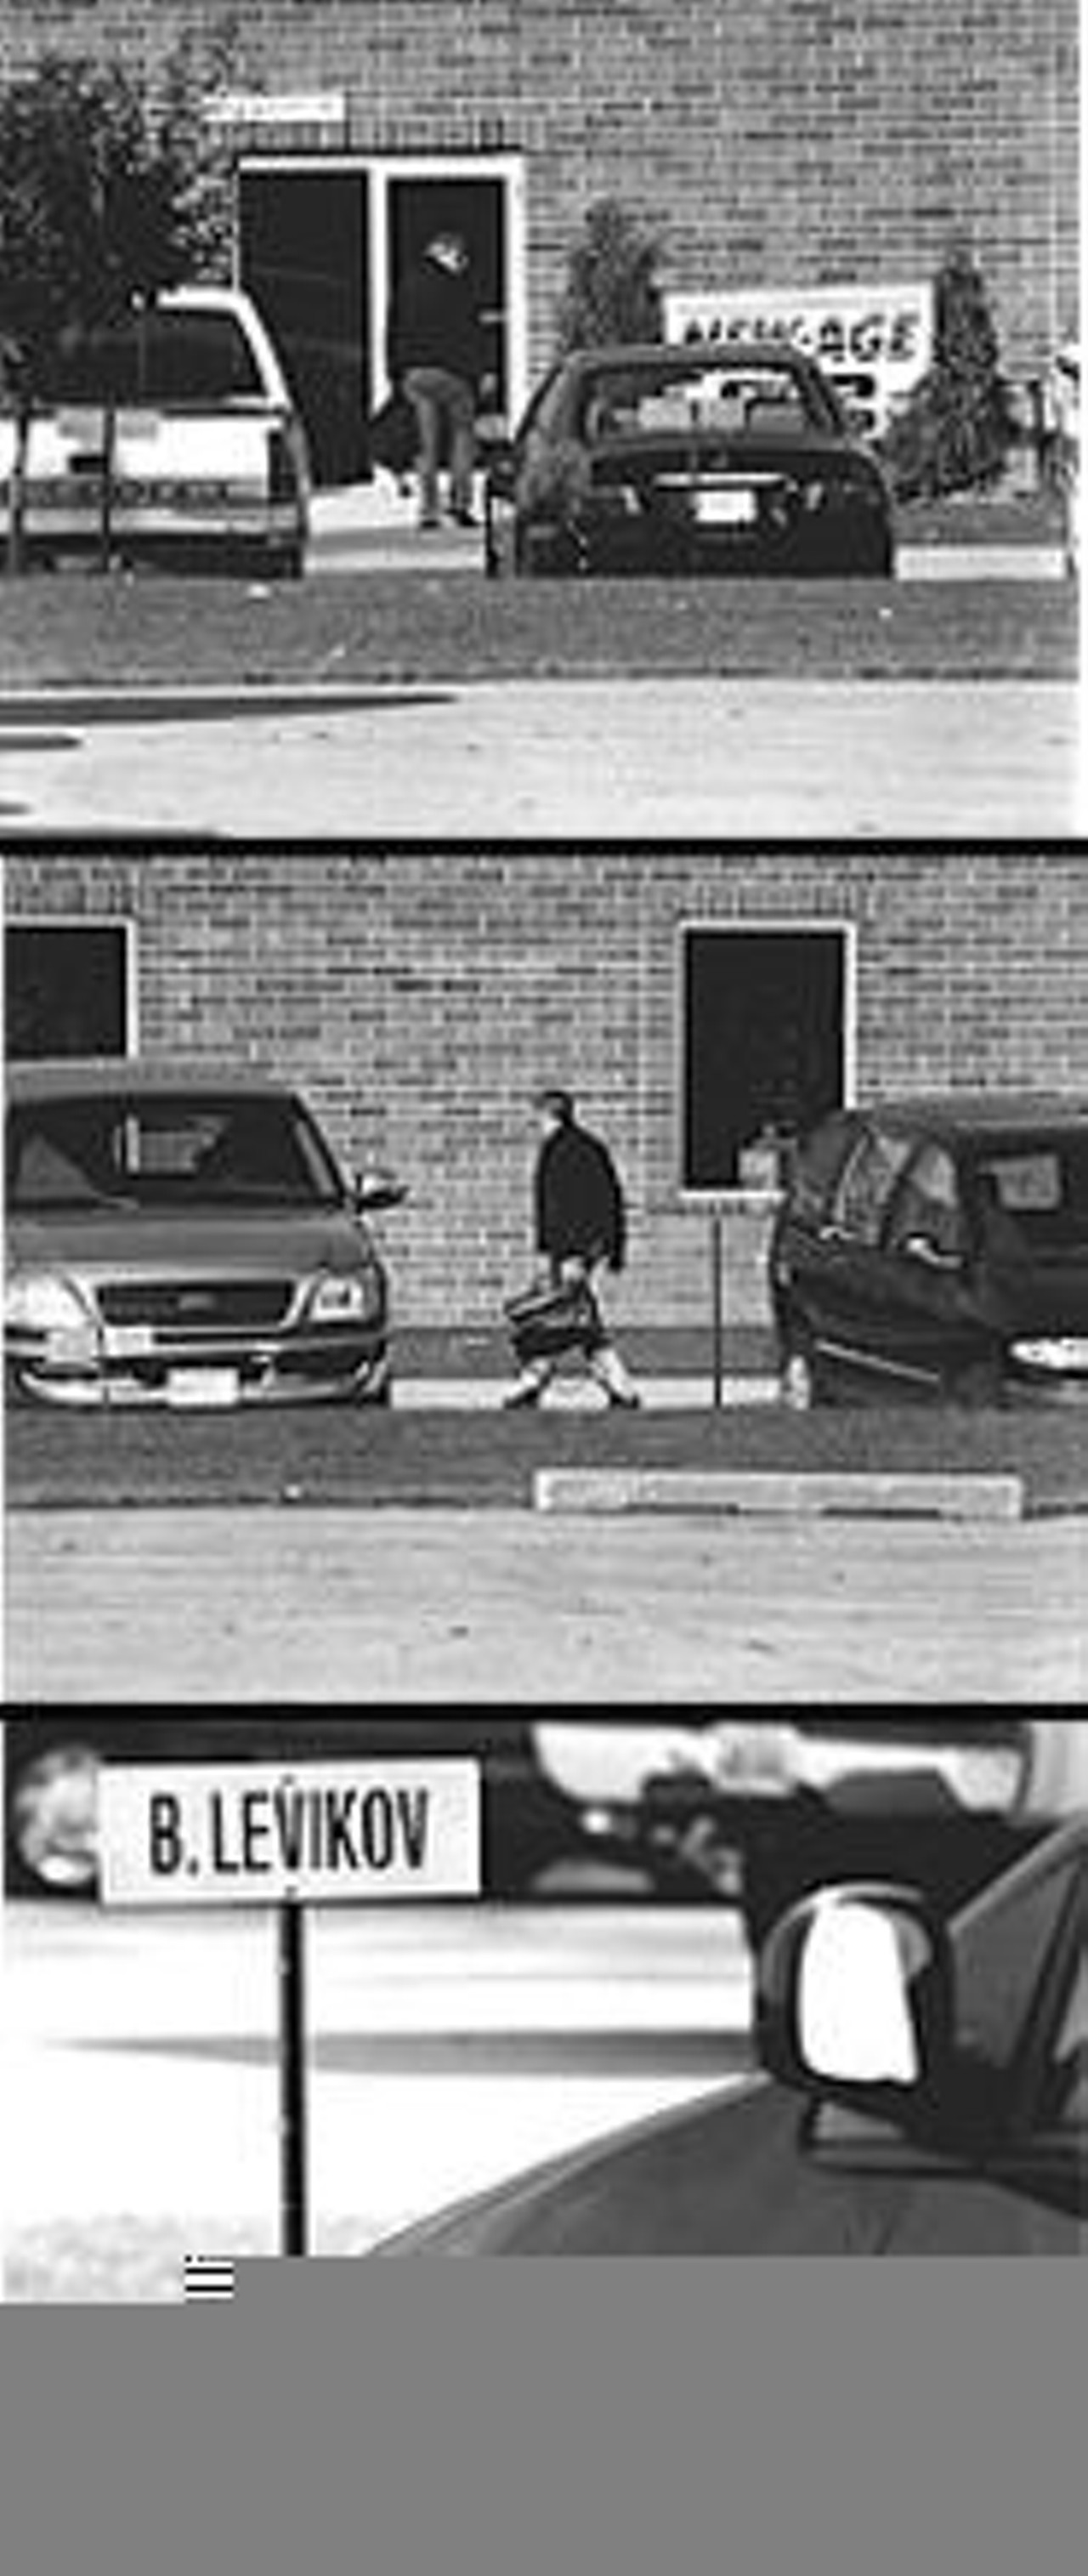 Comrades in Crime | News Lead | Cleveland | Cleveland Scene